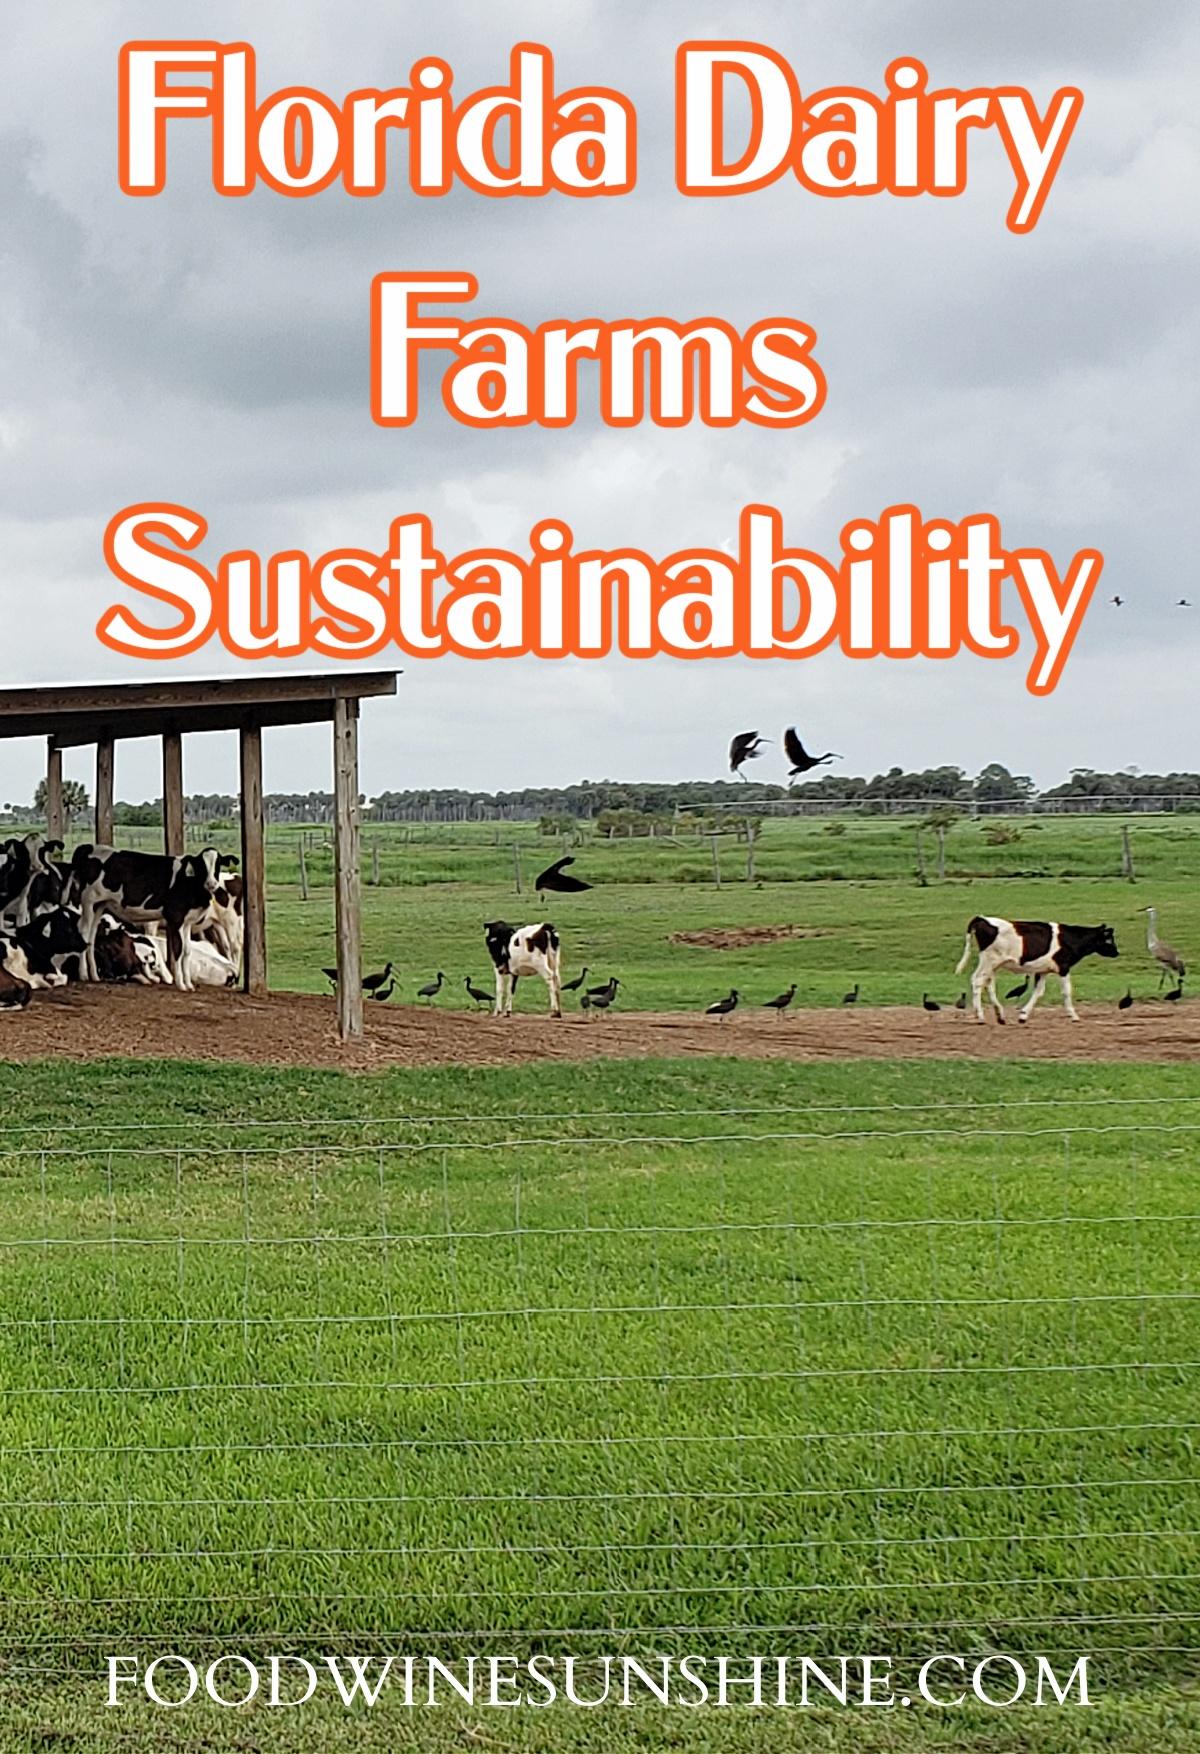 Florida Dairy Farm Sustainability